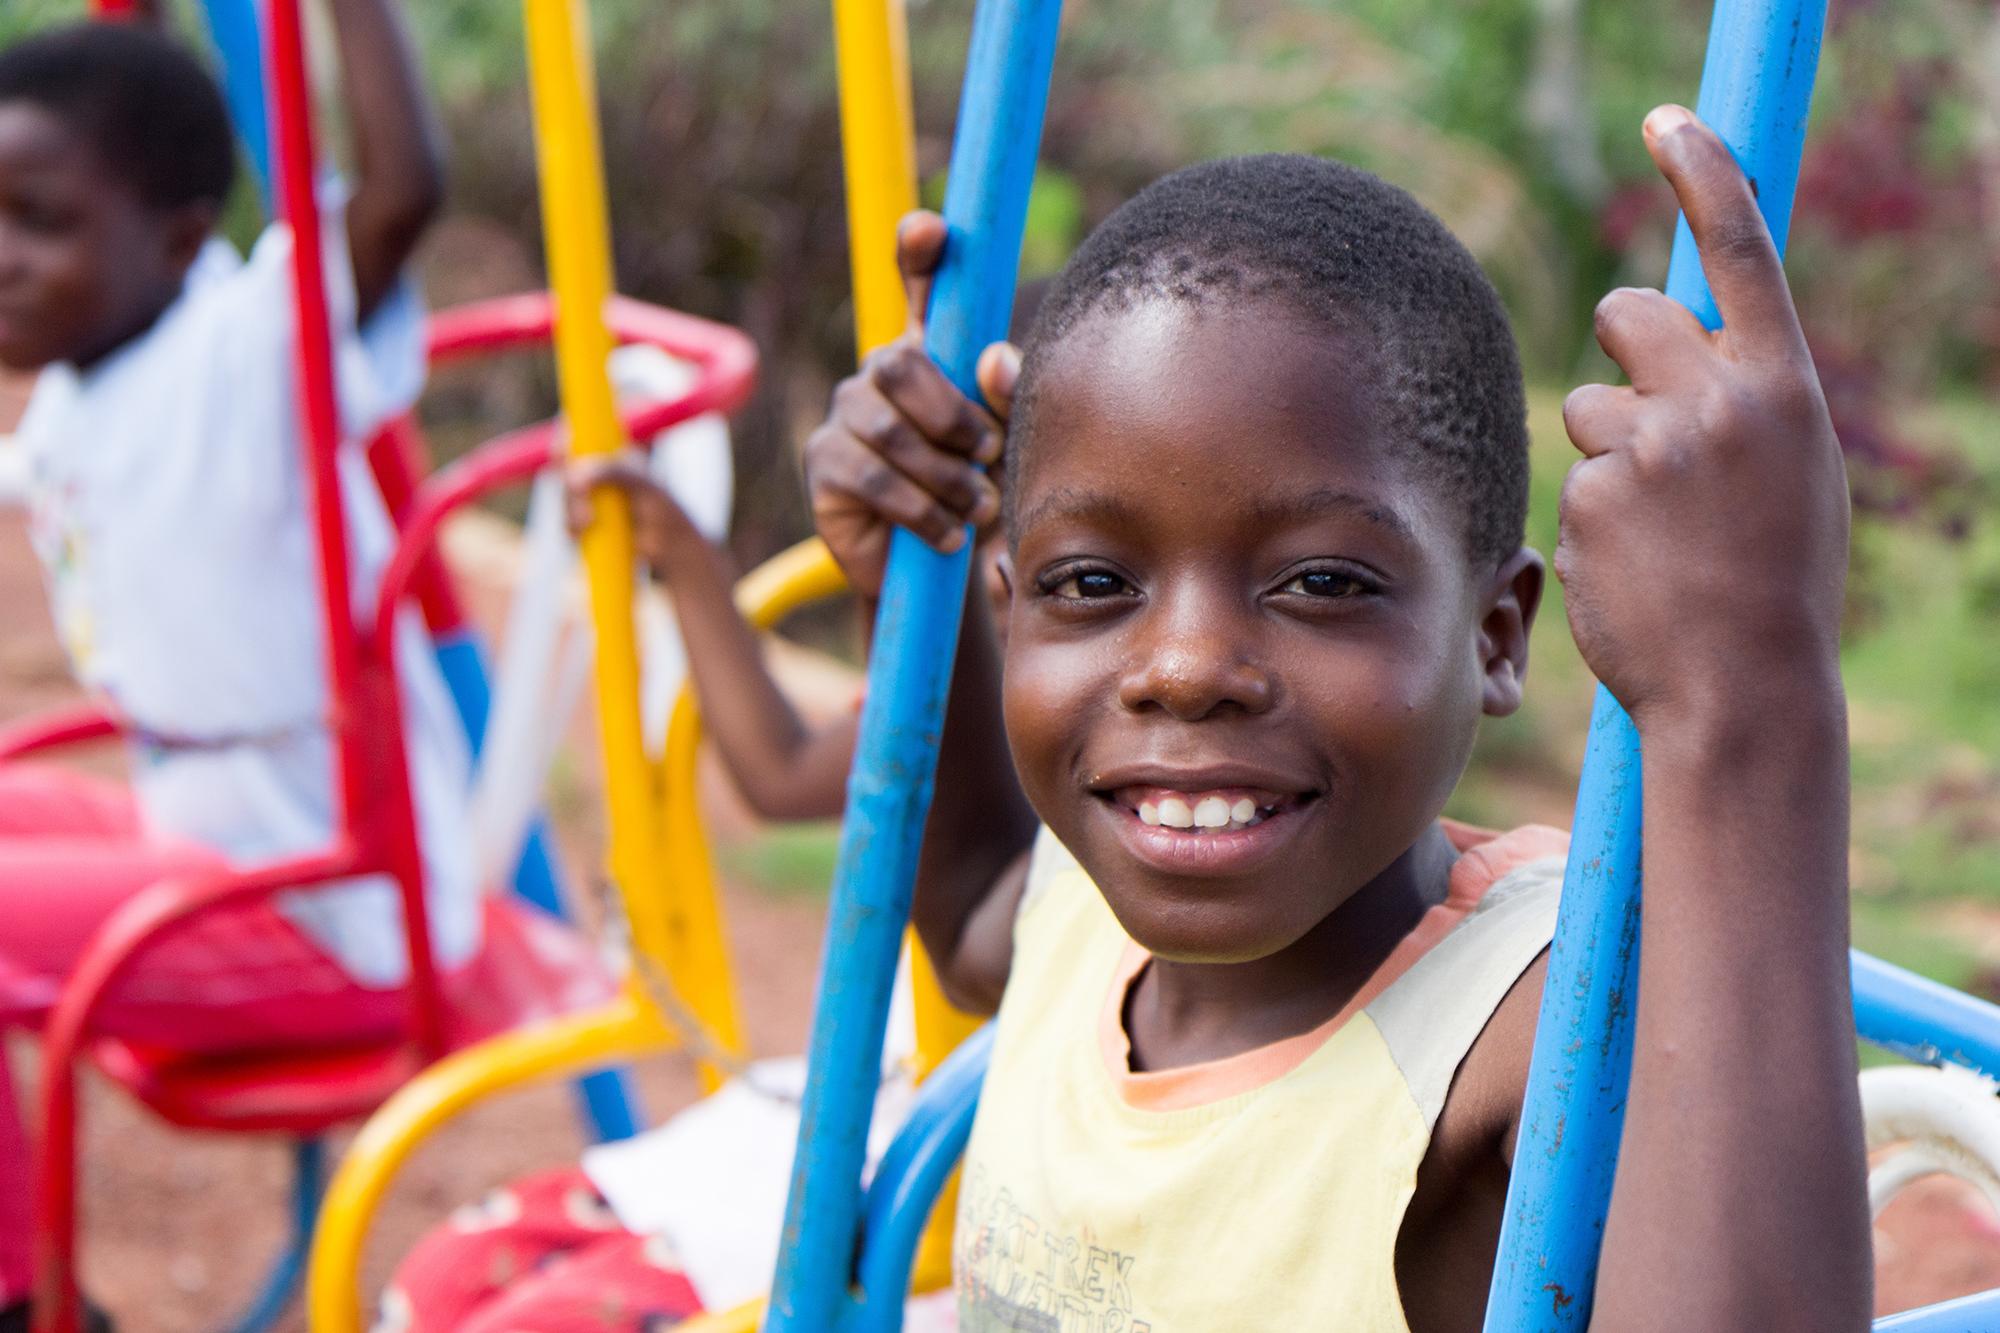 Ugandan boy swinging on a colorful swing